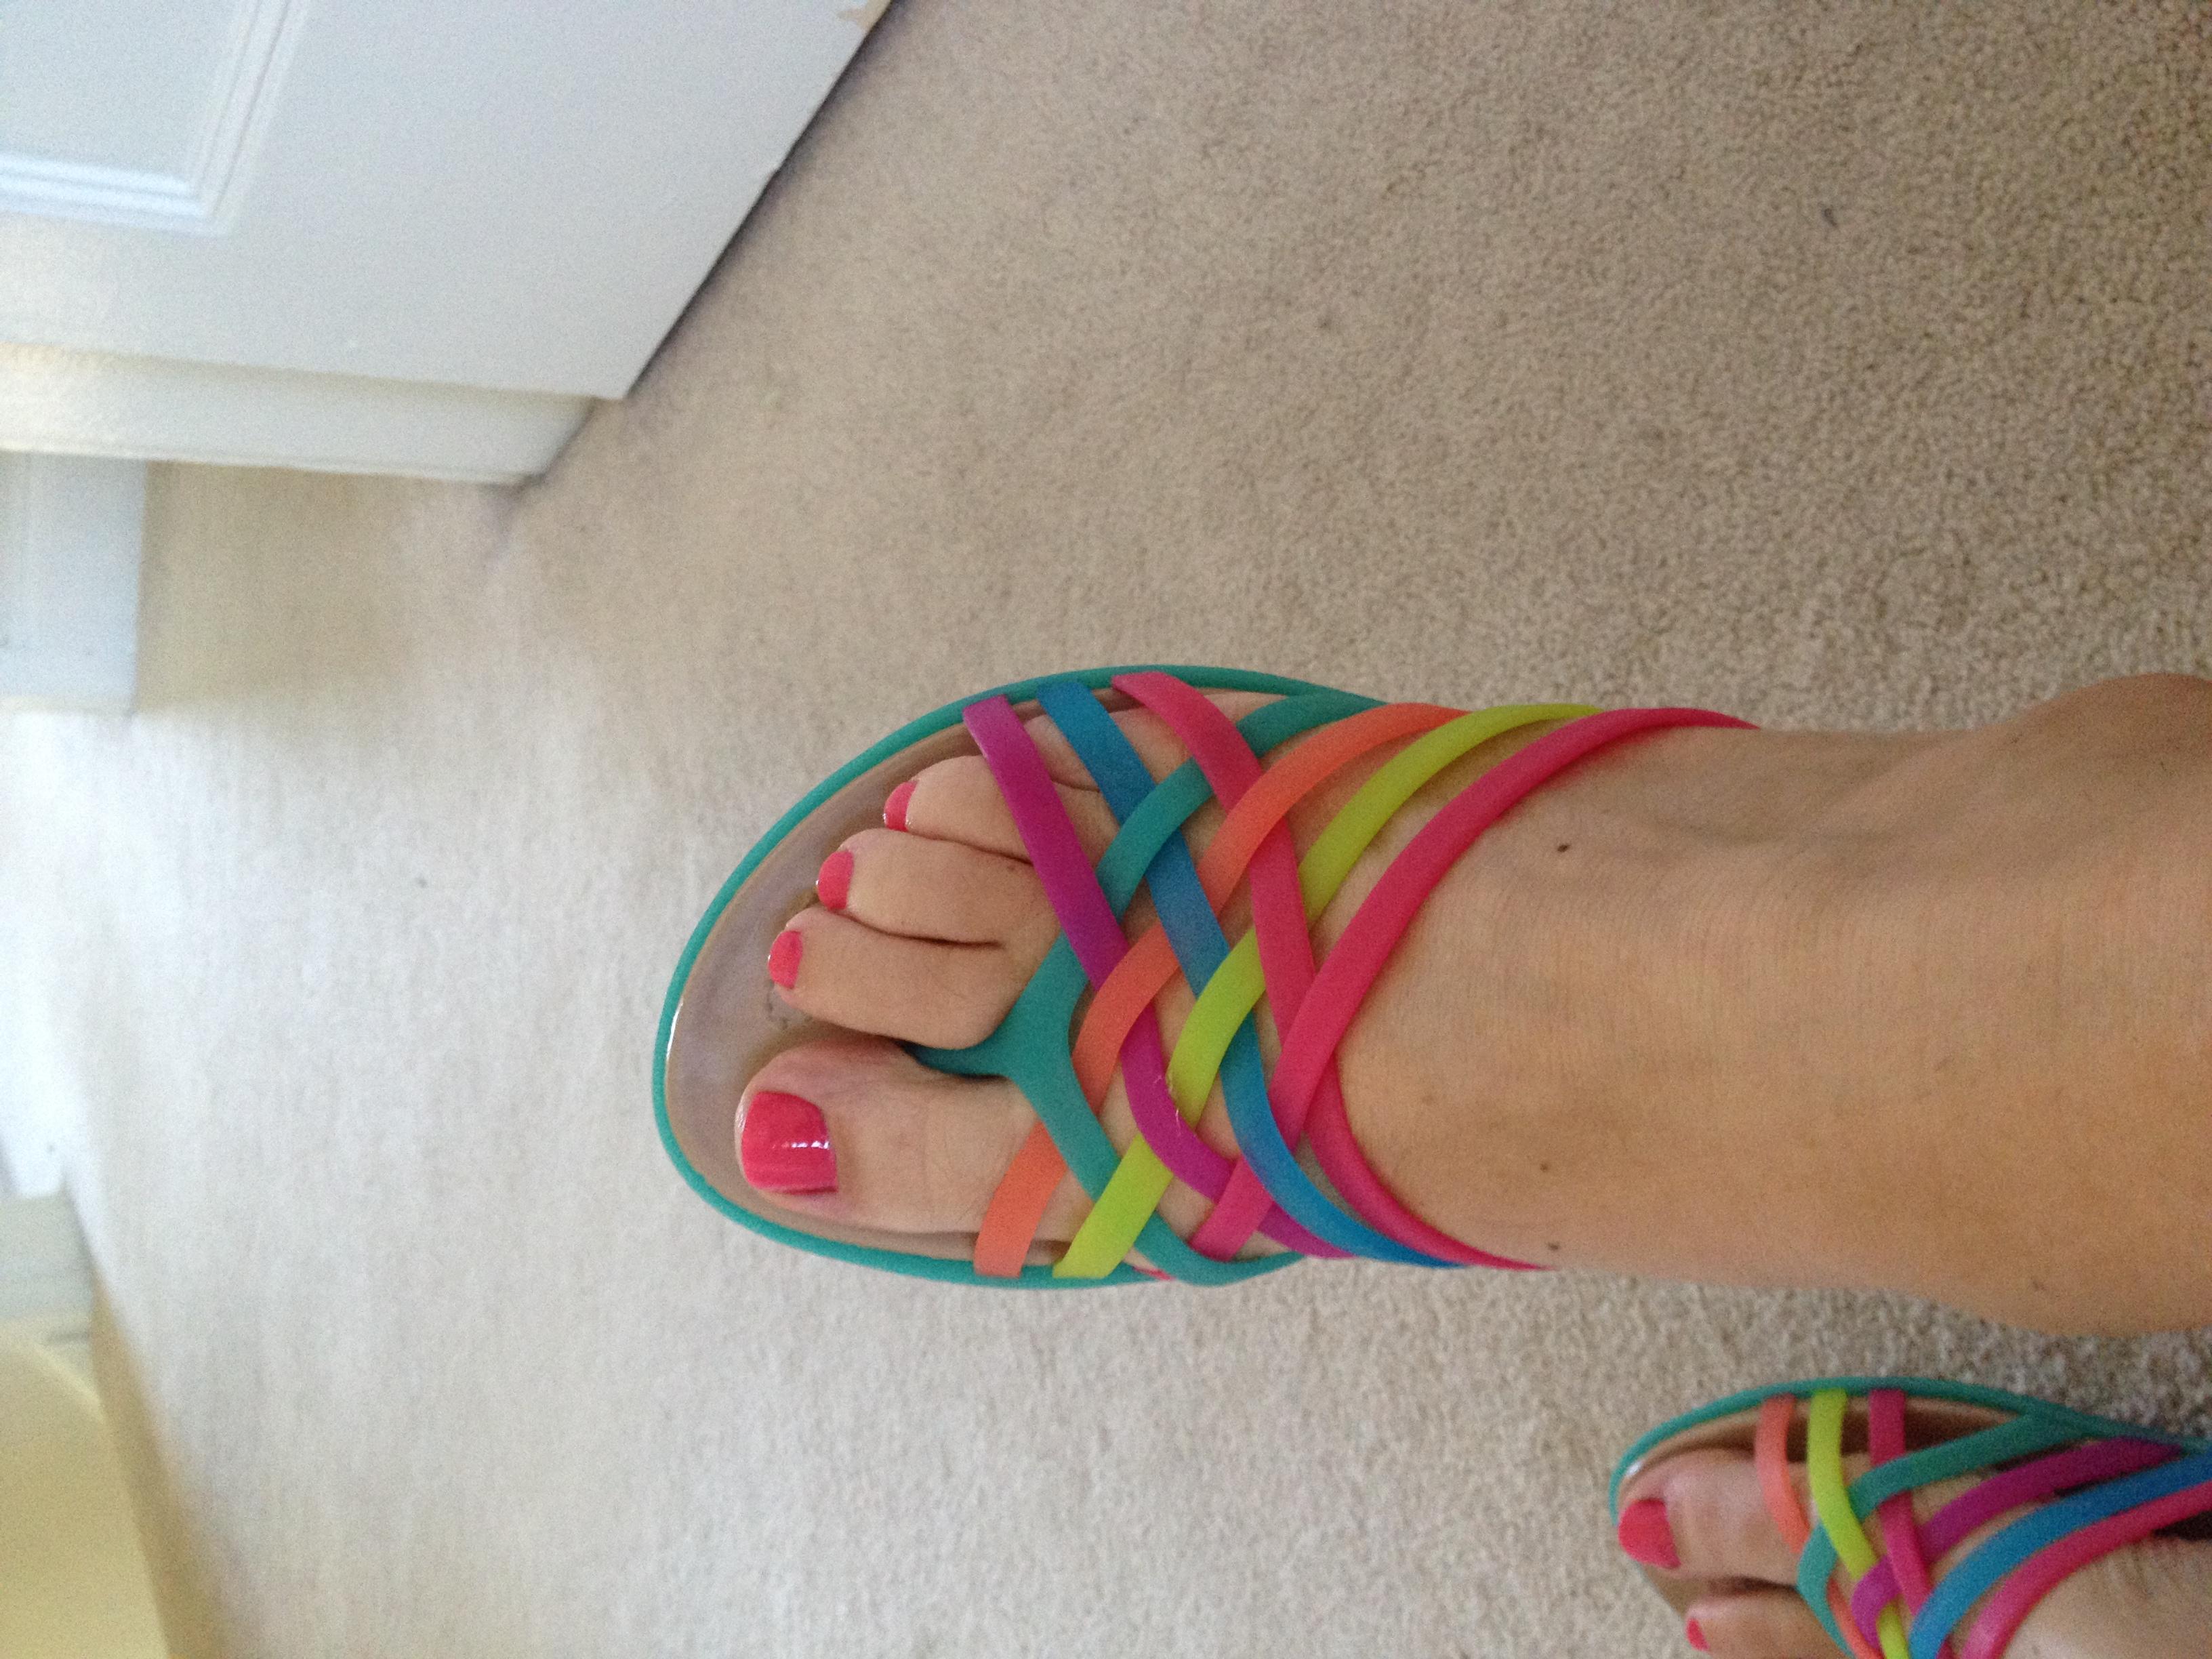 4e64e176dbd8 ... Women s Crocs Huarache Flip-Flops to review. photo (4) ...